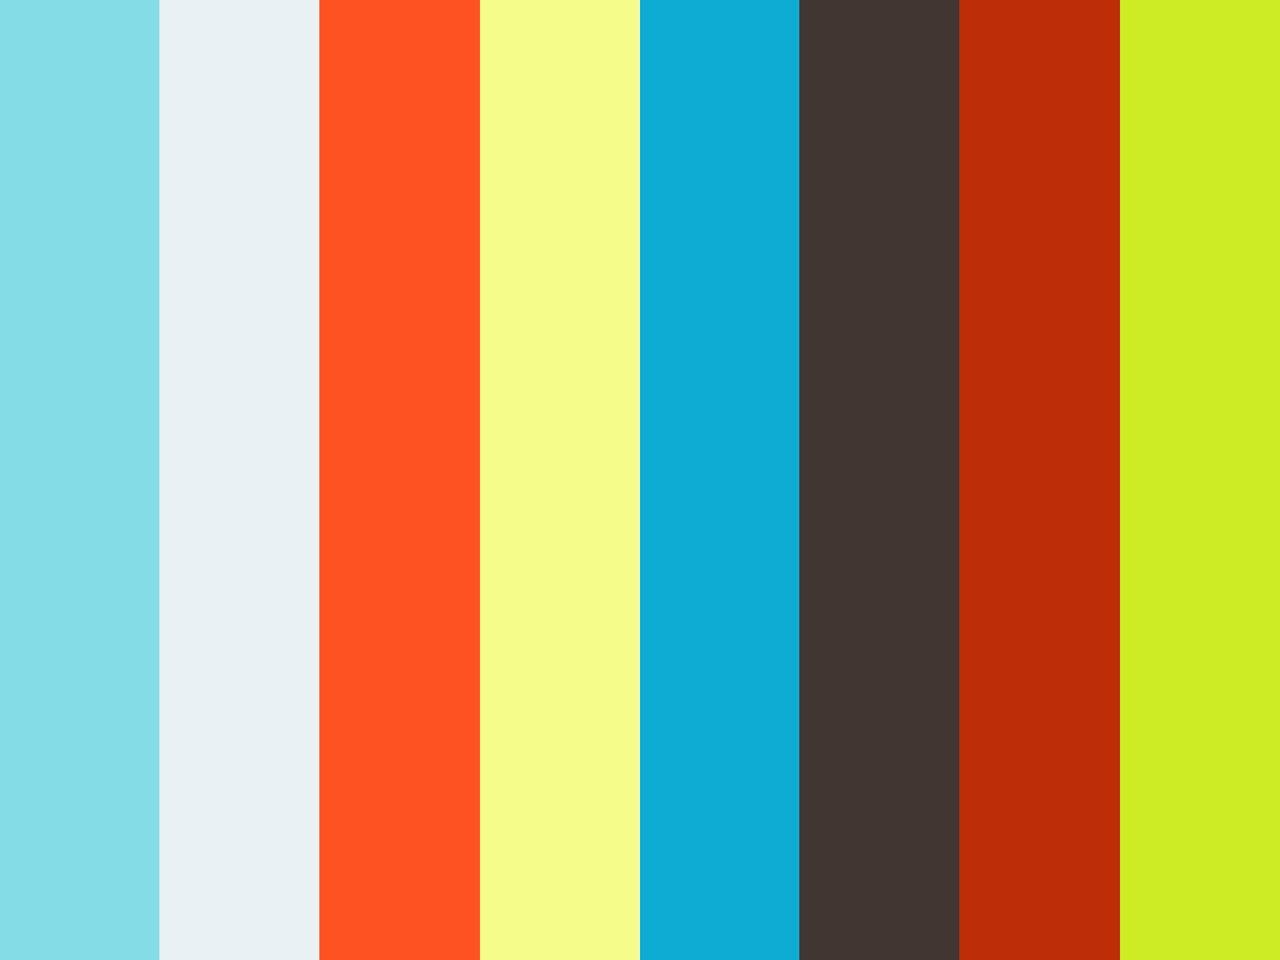 002765 - TV Provincie - PCVO